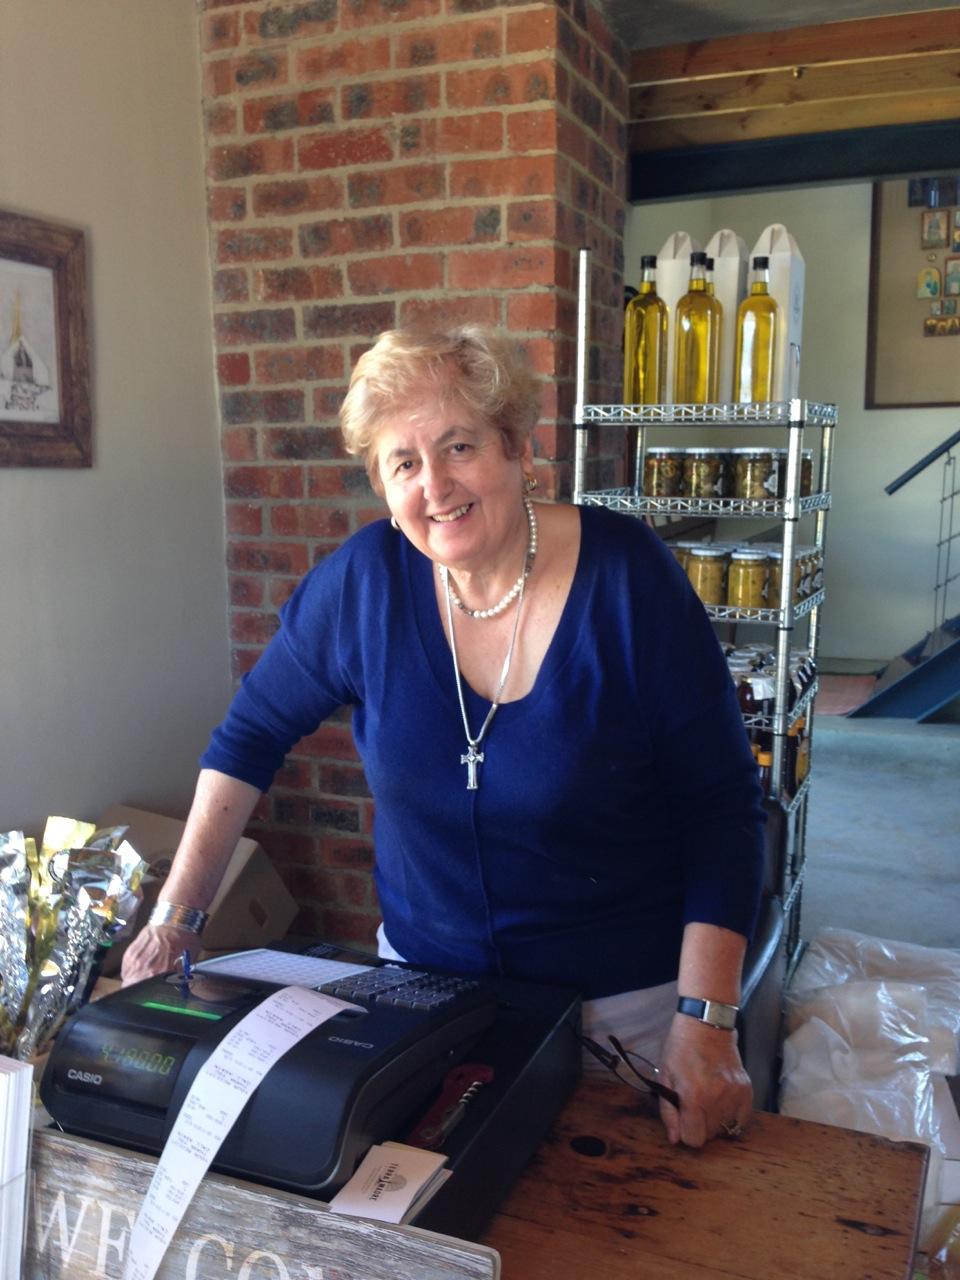 Nicole's Mom Koula - her inspiration in life!